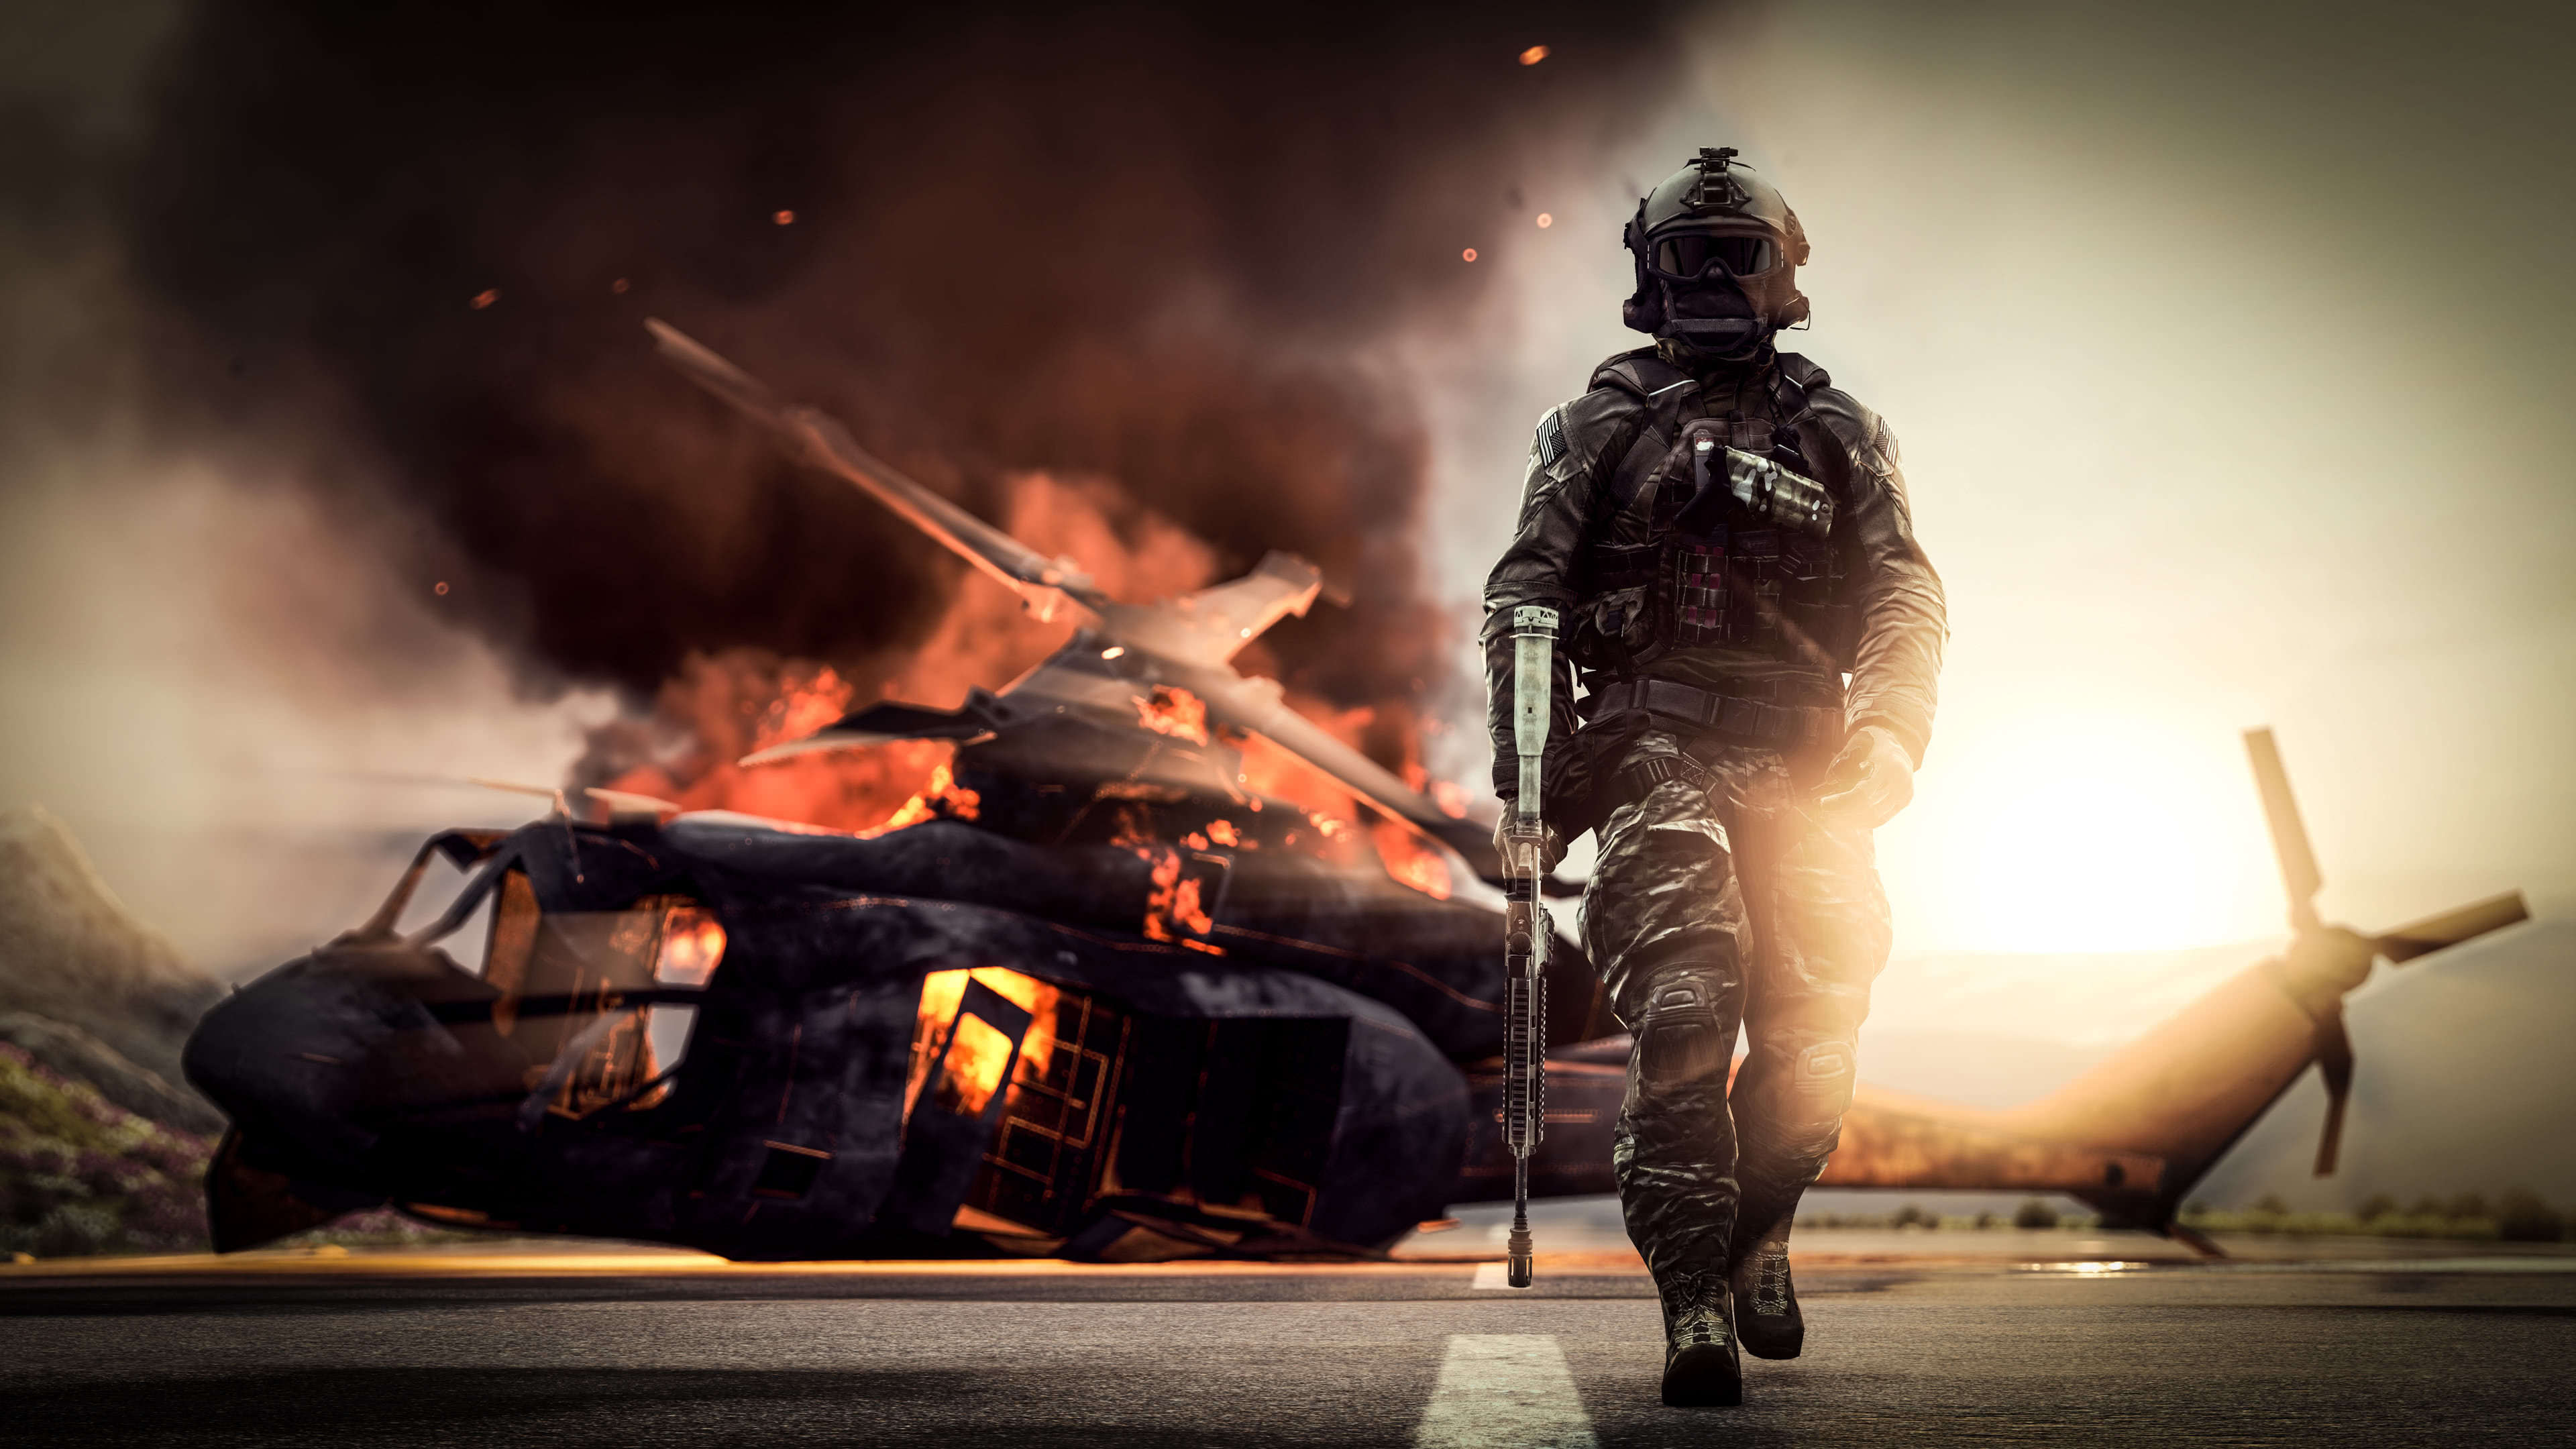 Battlefield 4 Soldier Helicopter Uhd 4k Wallpaper Pixelz